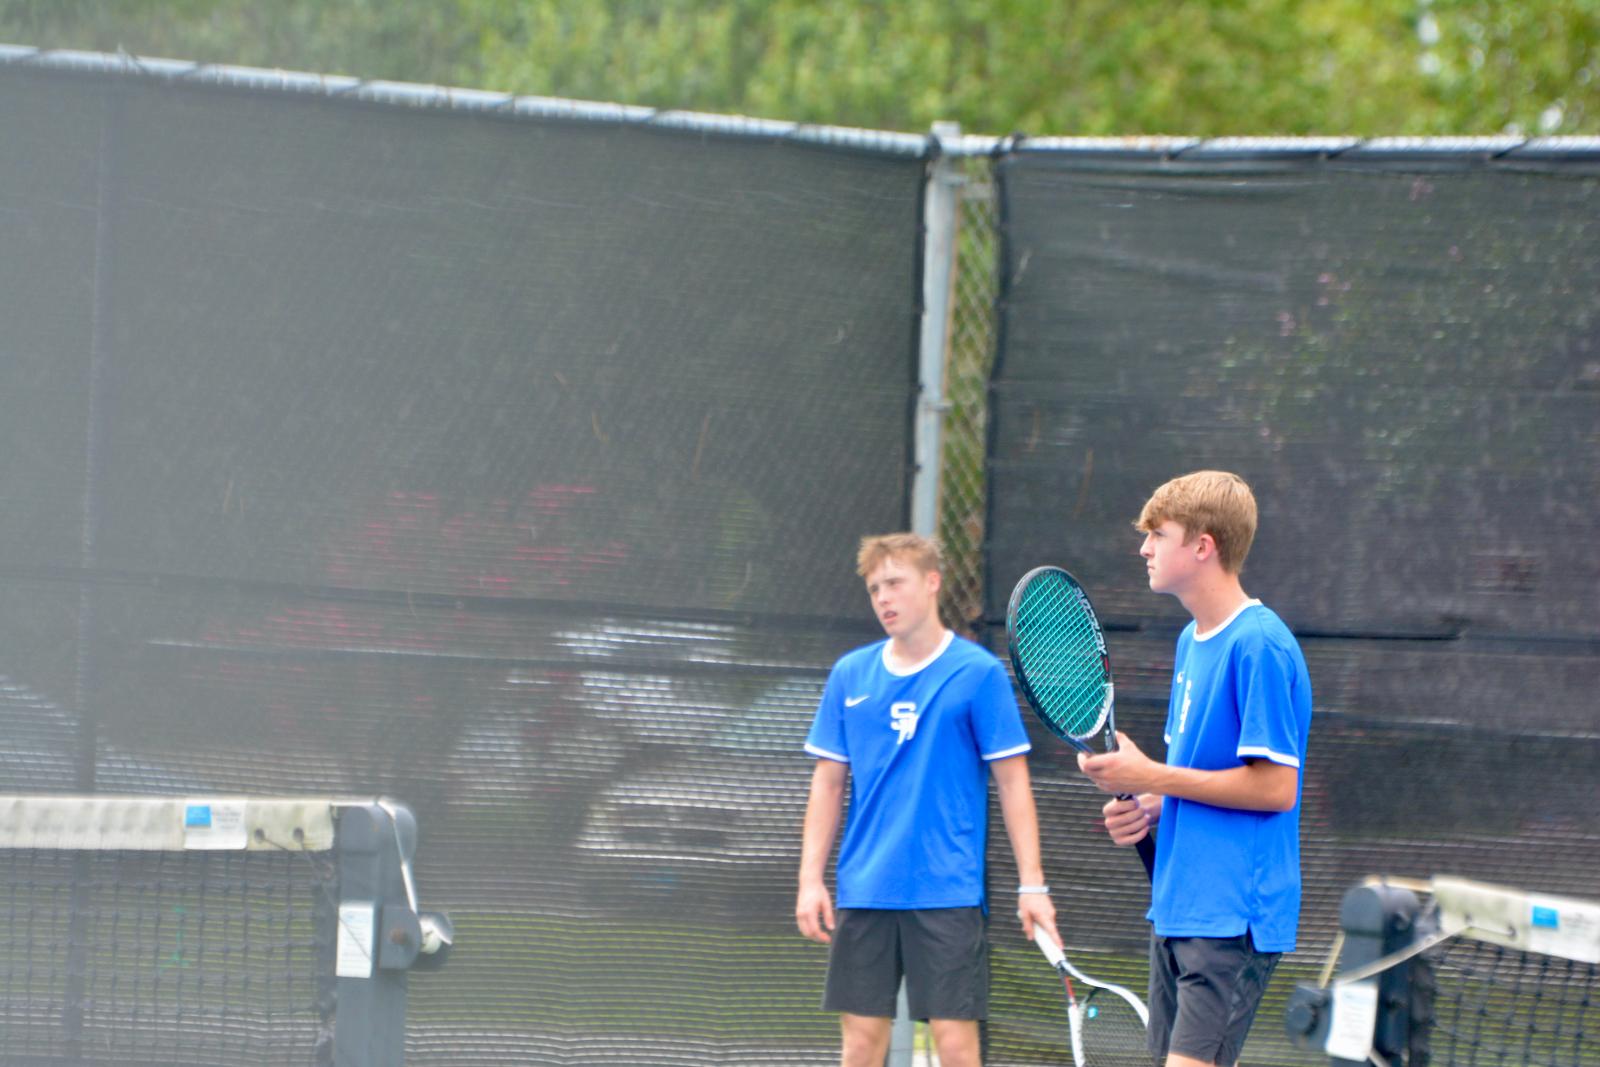 Team Tennis falls short against Lindale